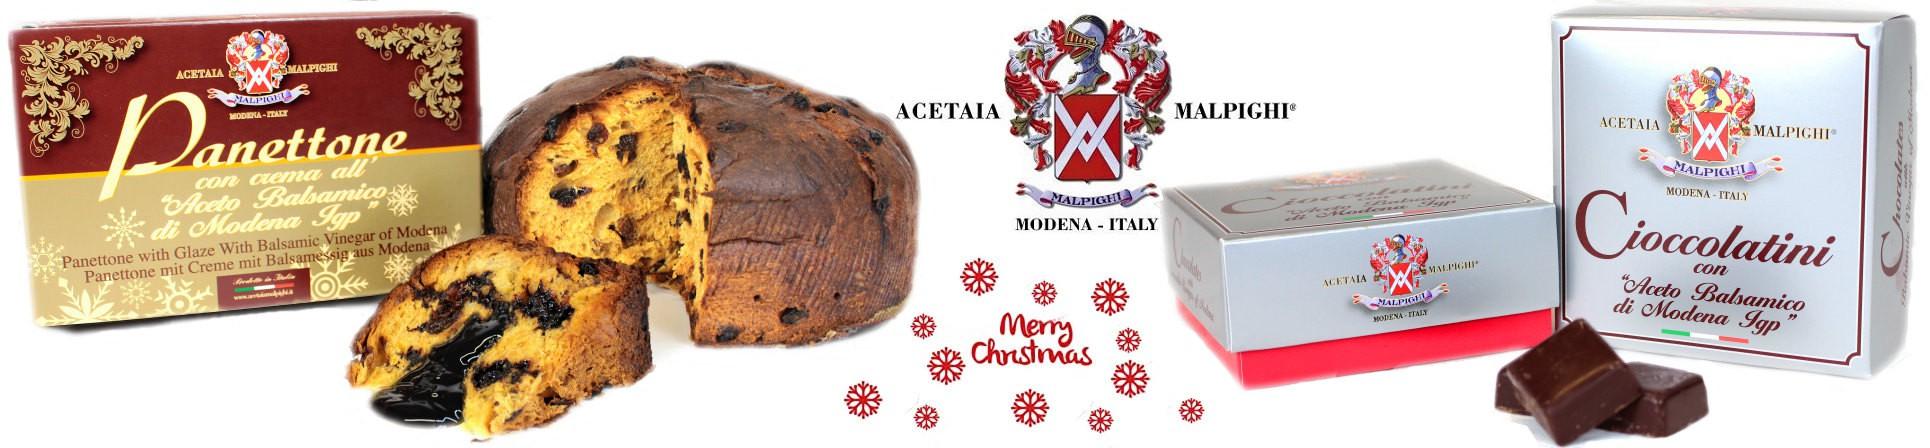 Vendita online Panettone all'aceto balsamico  - Acetaia Malpighi